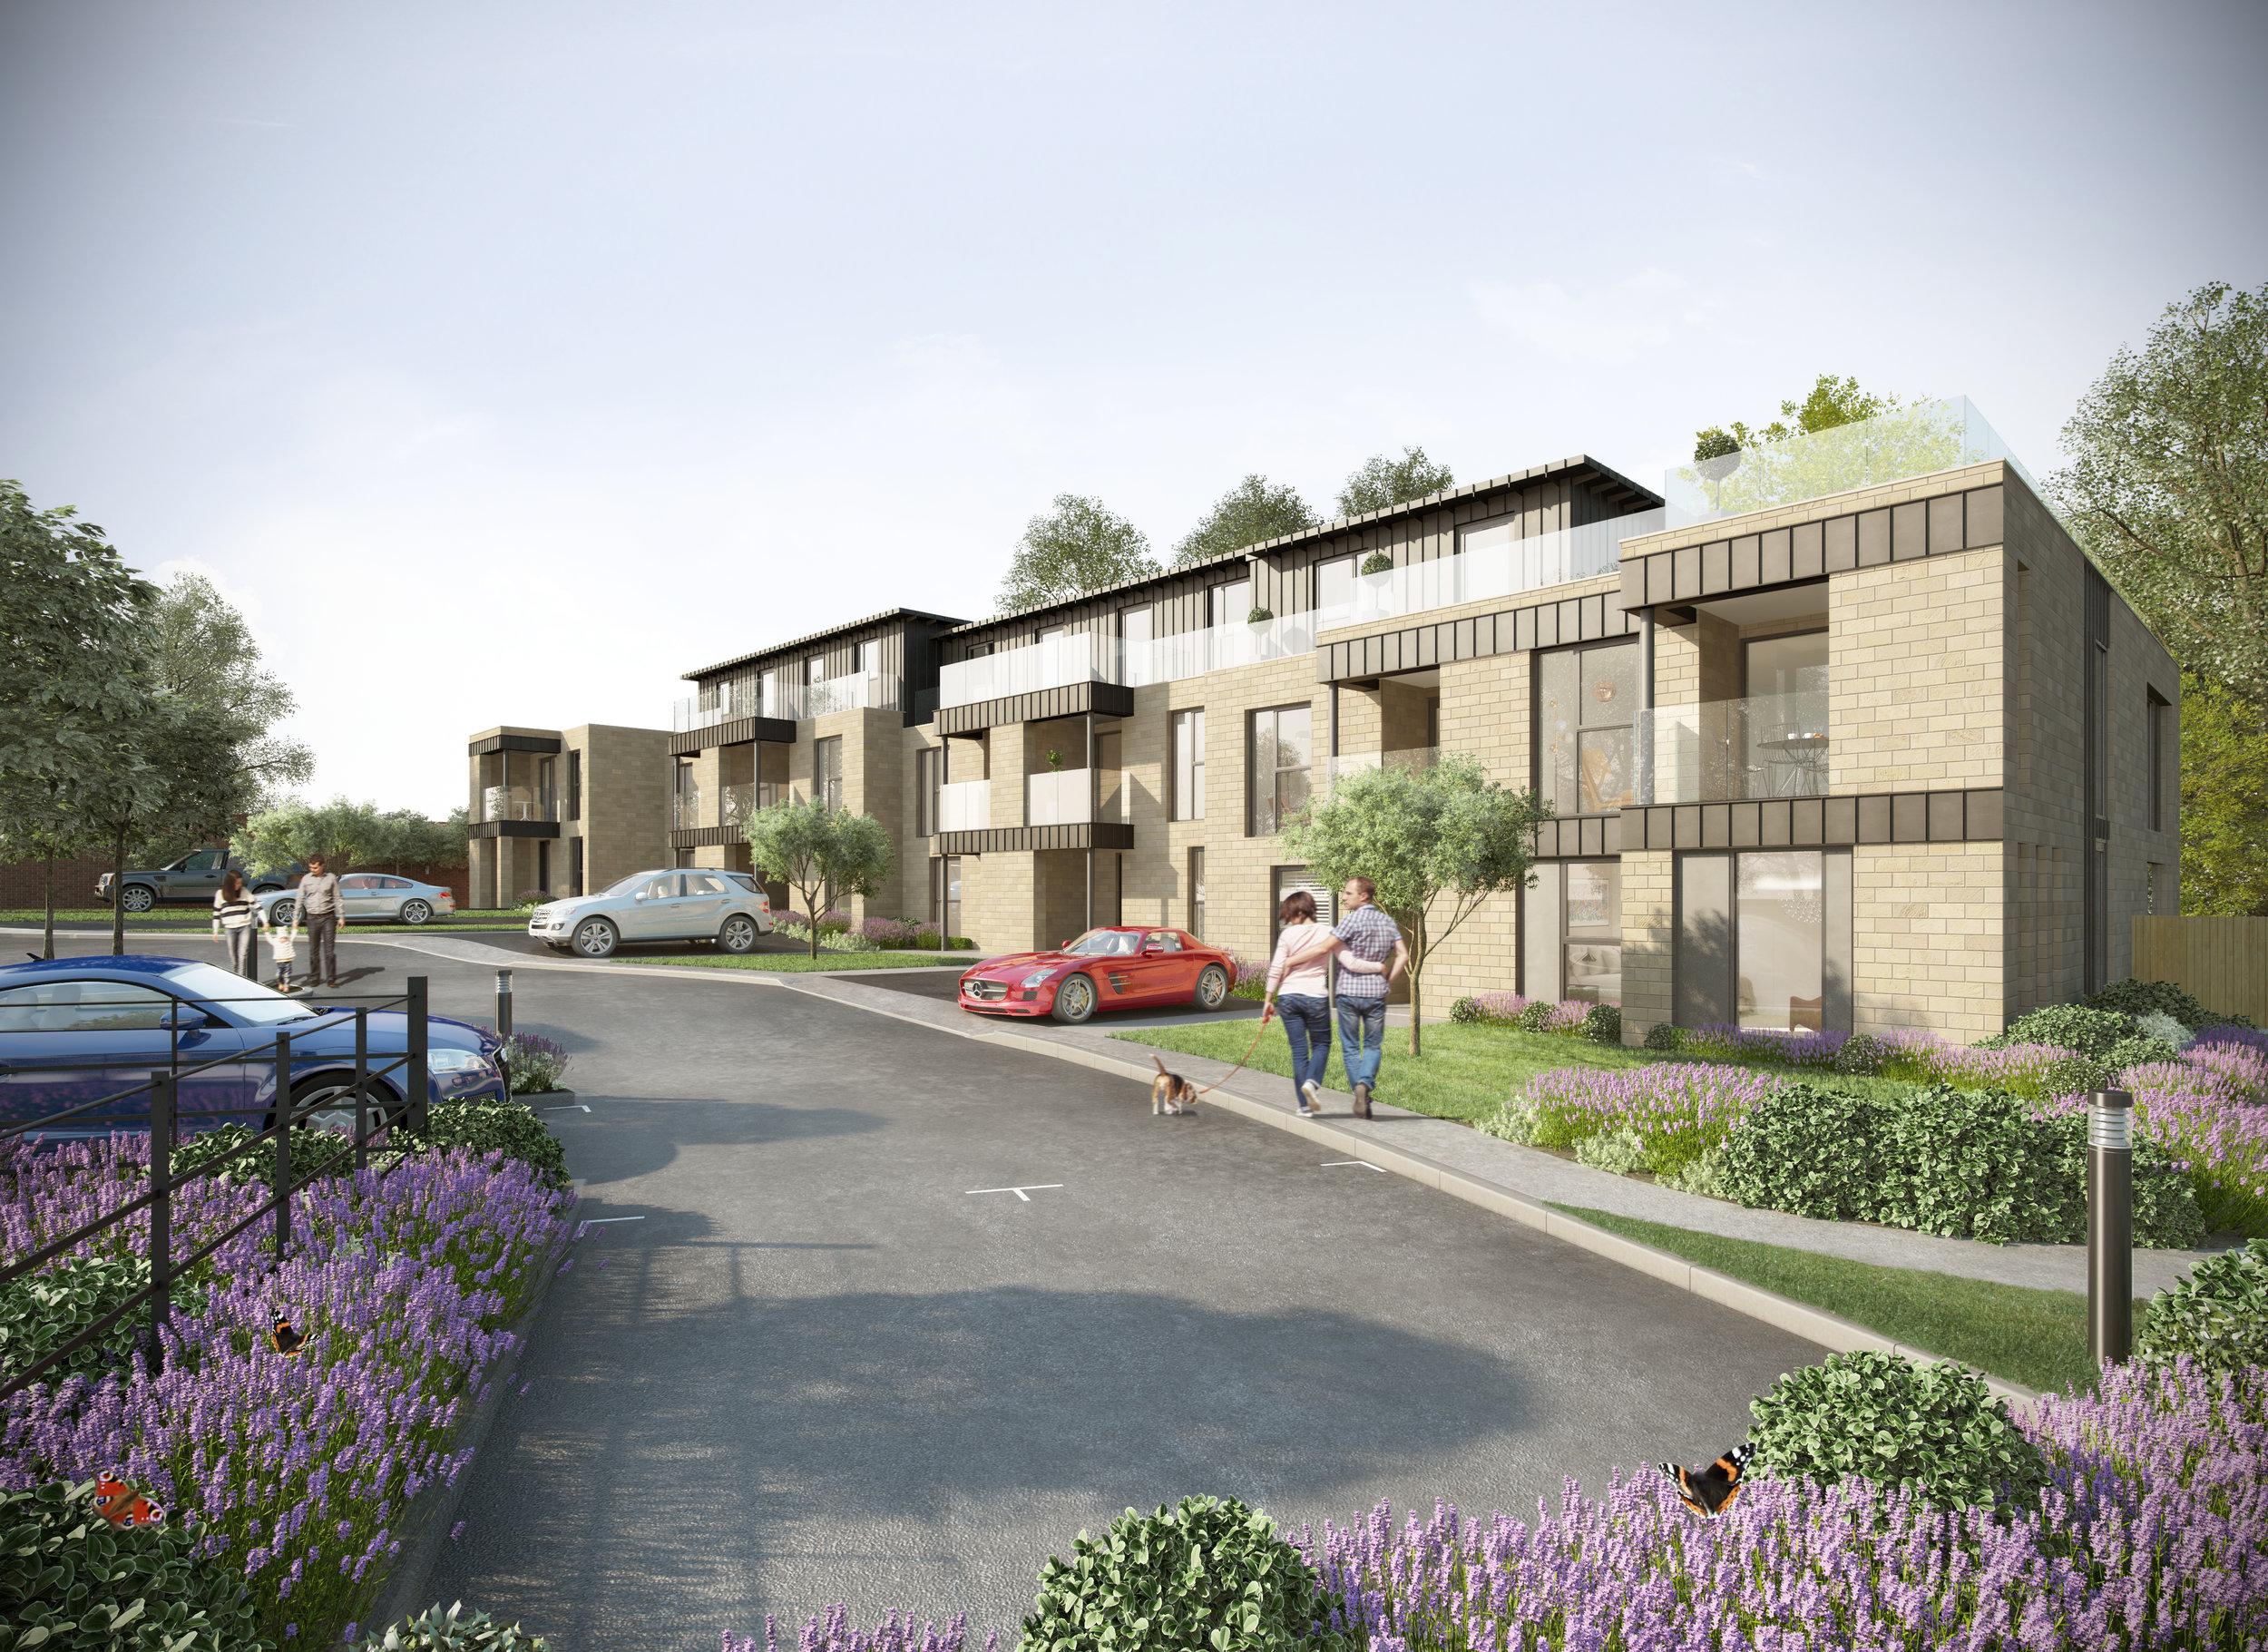 Spenfield_House_New_Build_Exterior.jpg